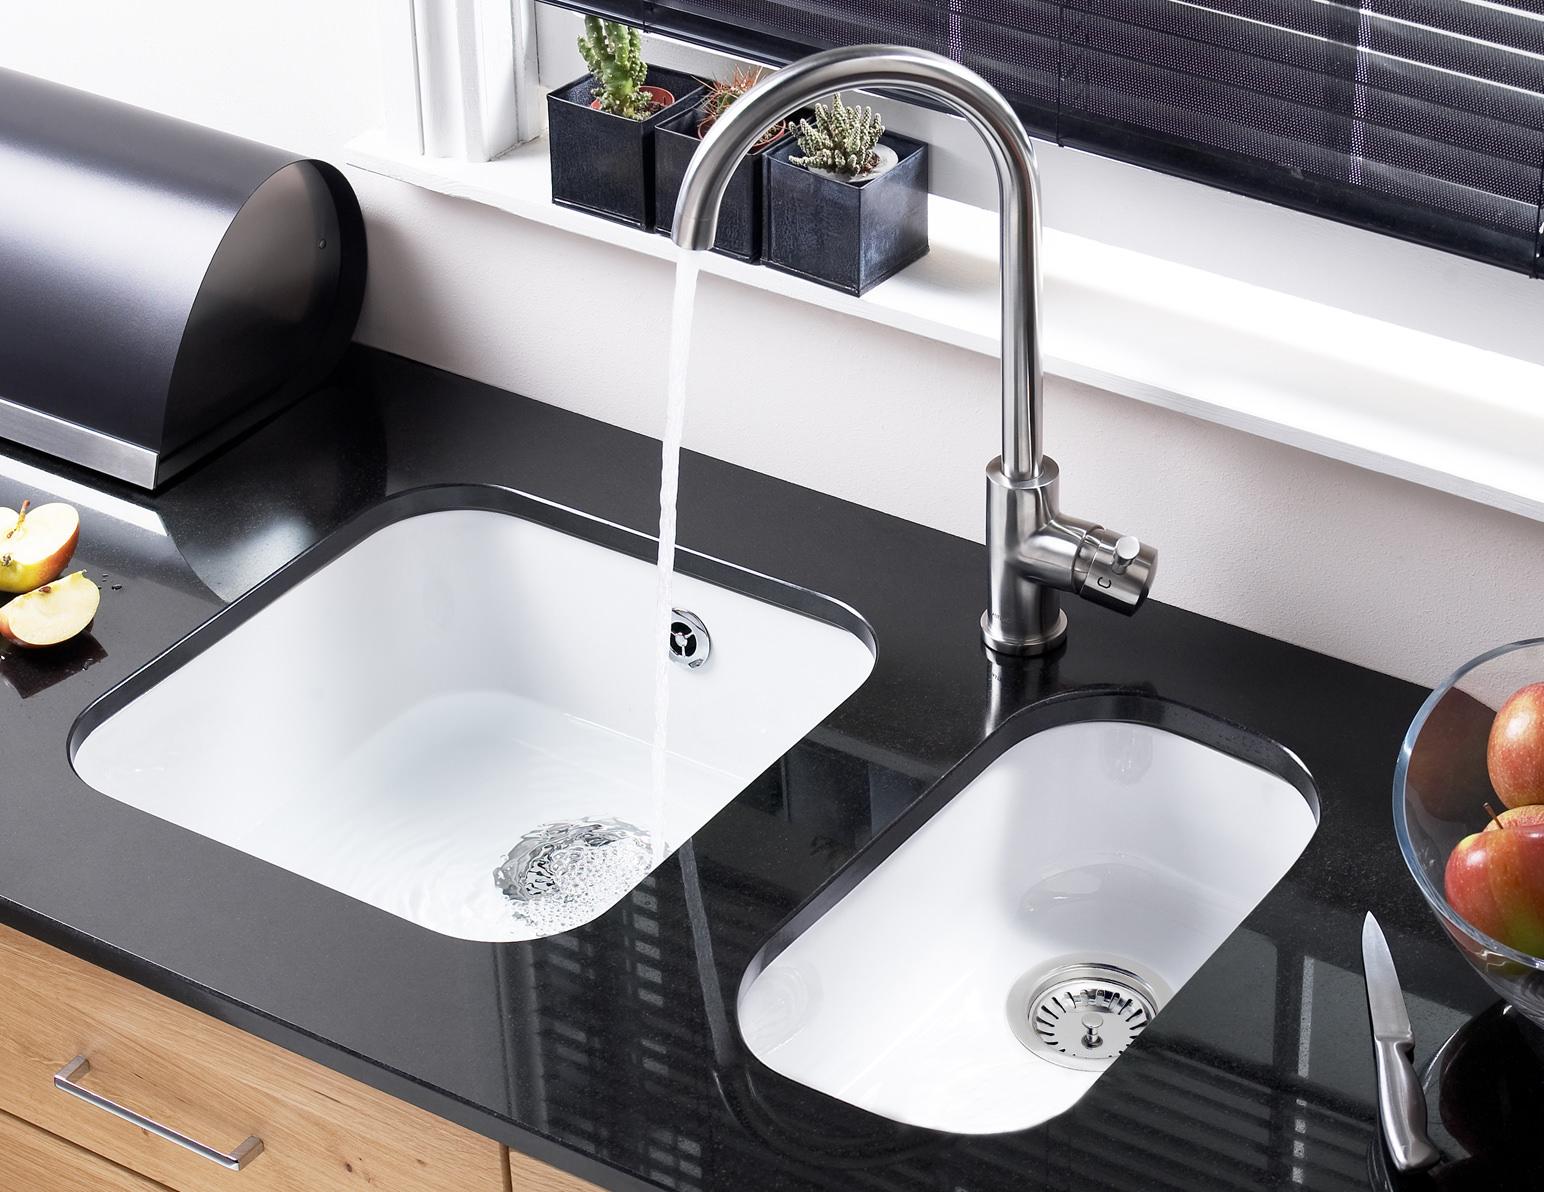 Astracast Lincoln 4040 Gloss White Ceramic Undermount Sink   Main Bowl